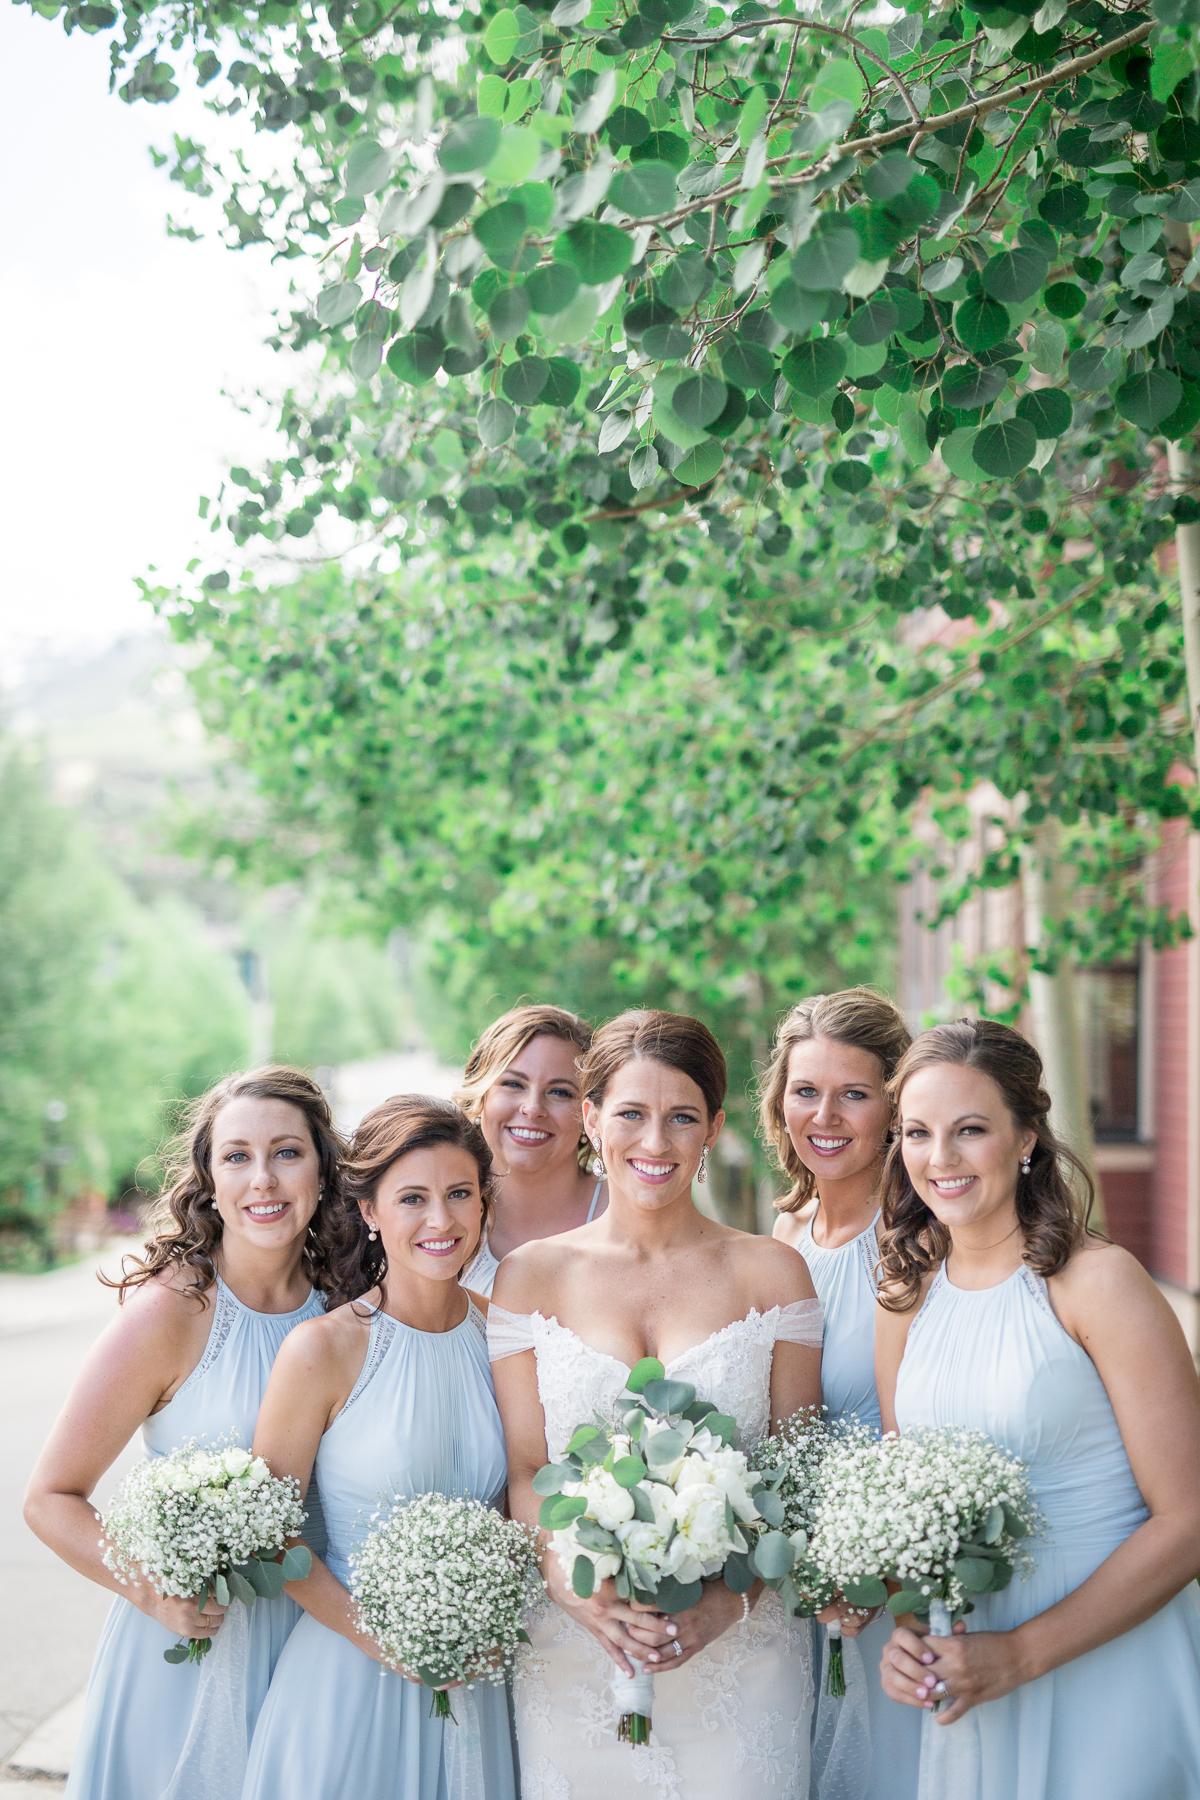 StaciDesign-Colorado-Wedding-4820.jpg